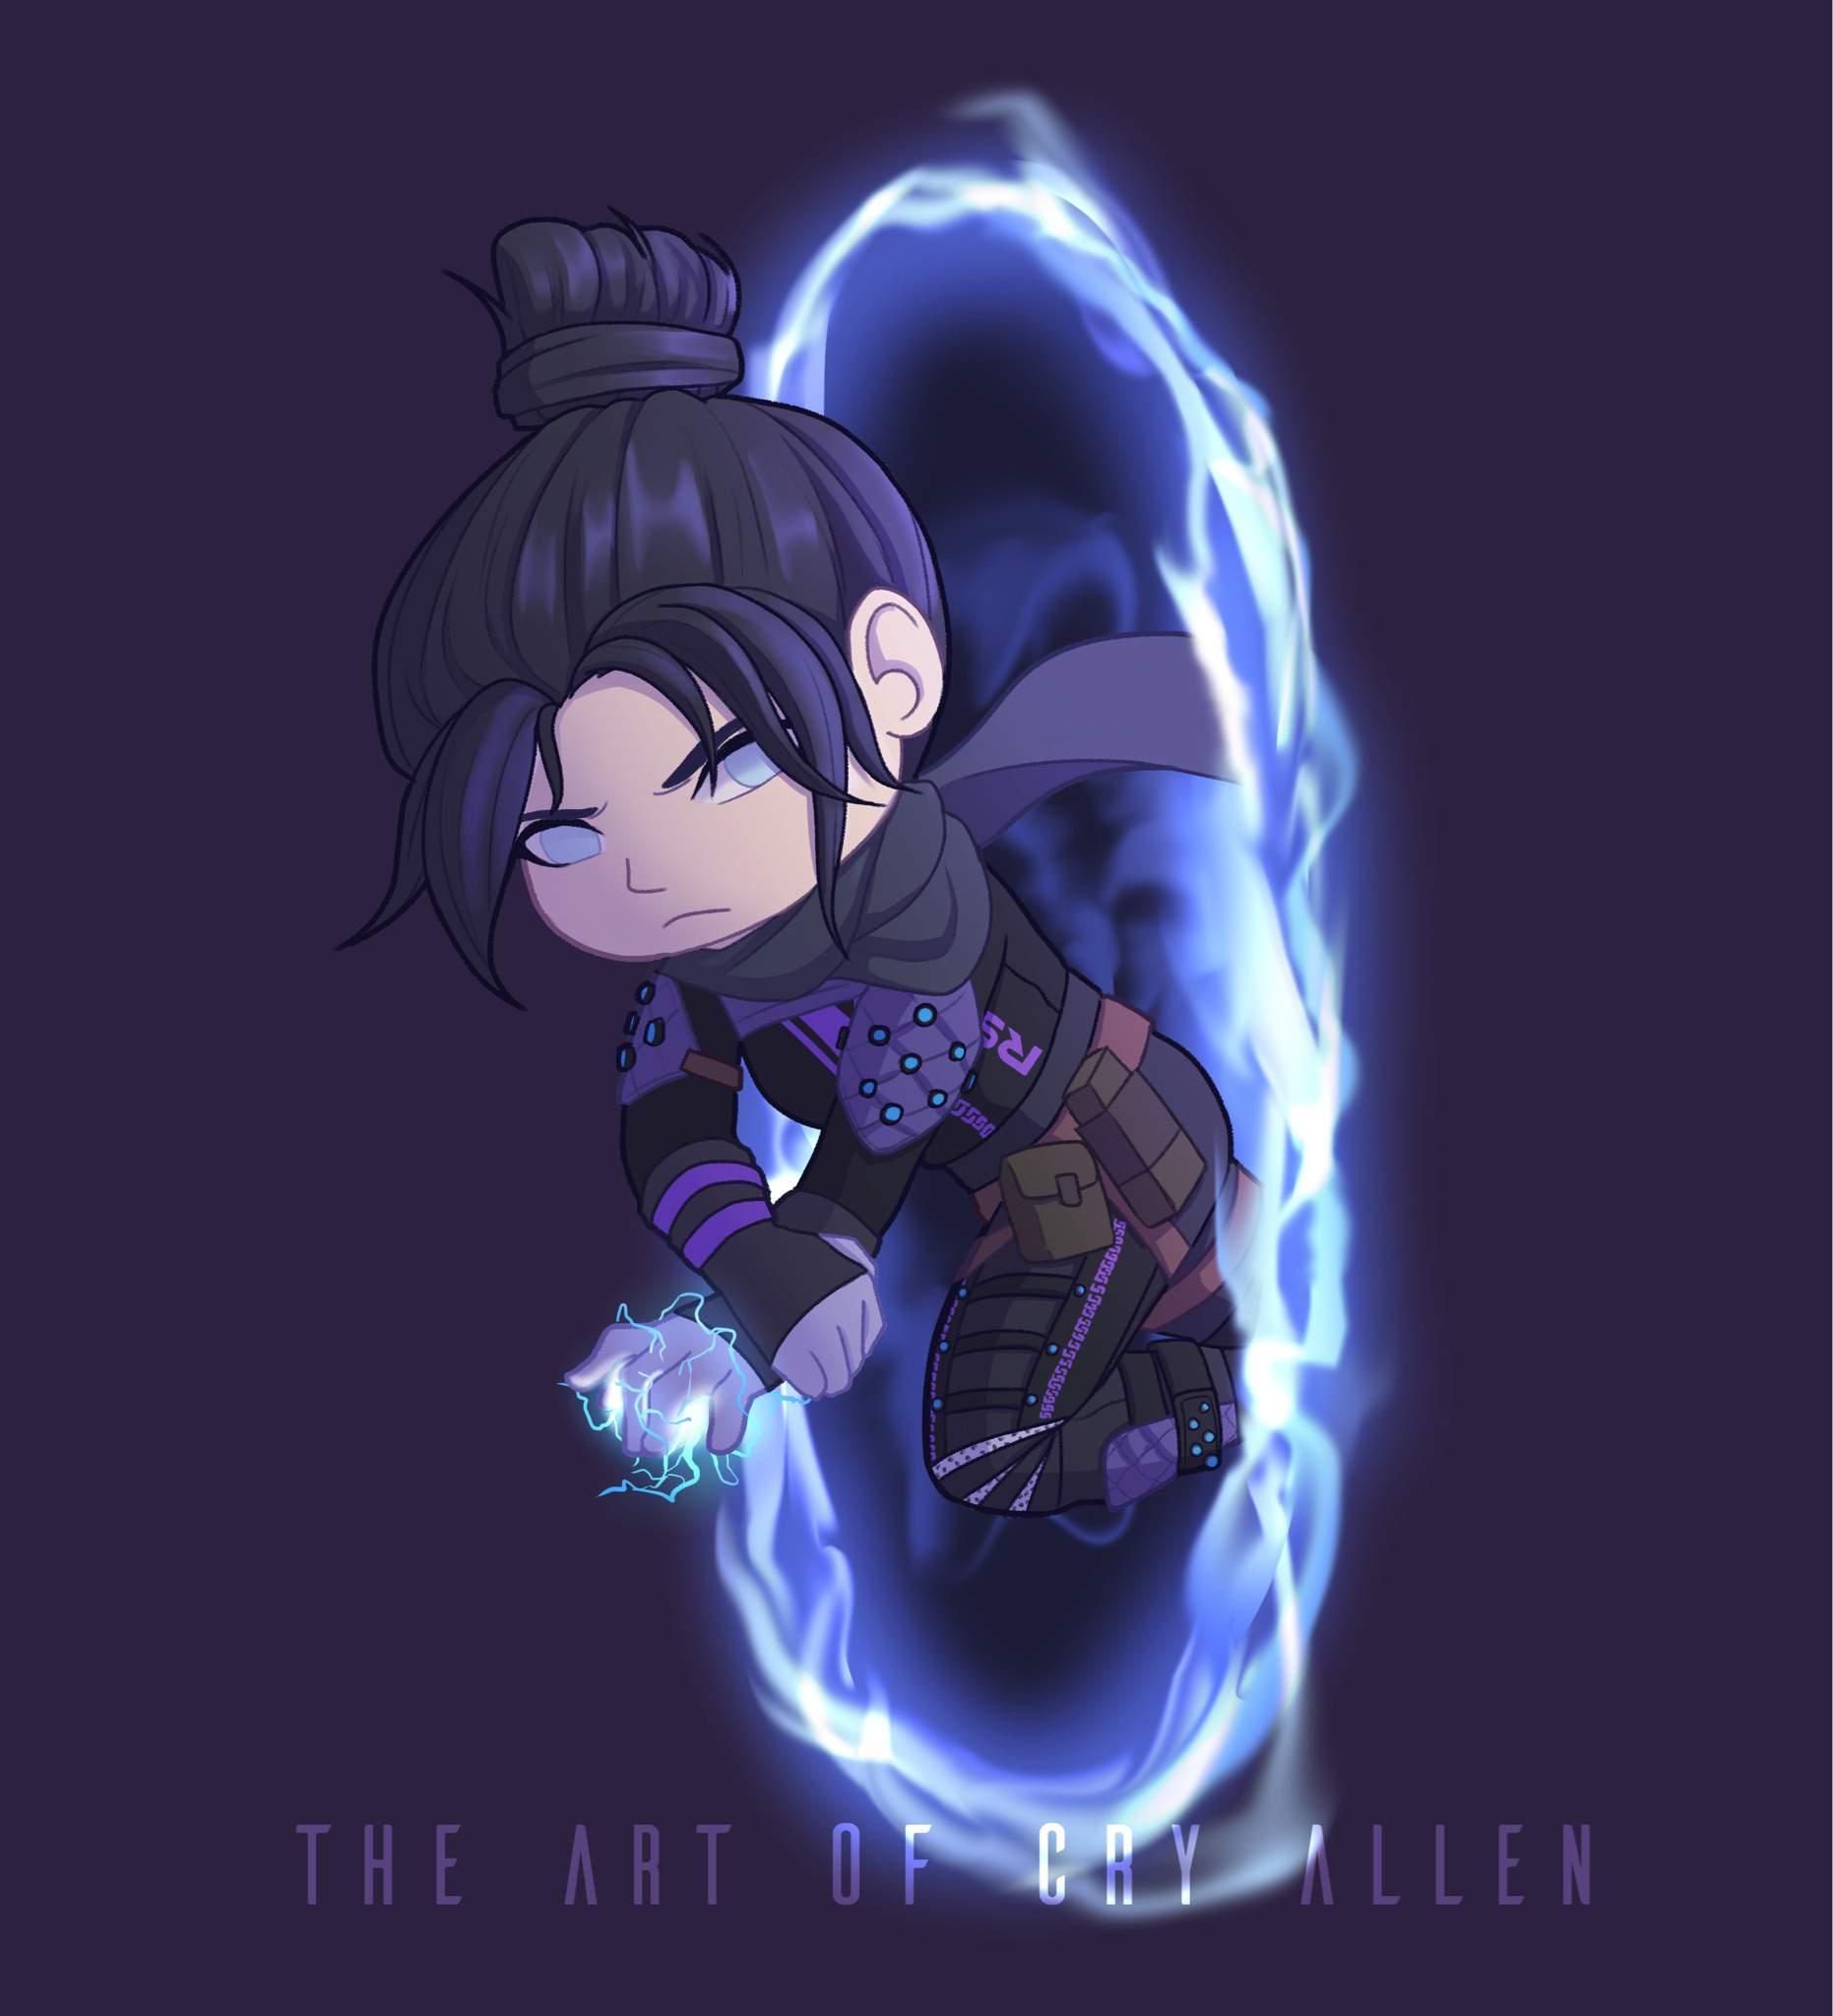 Wraith Chibi Apex Legends Armory Amino Amino